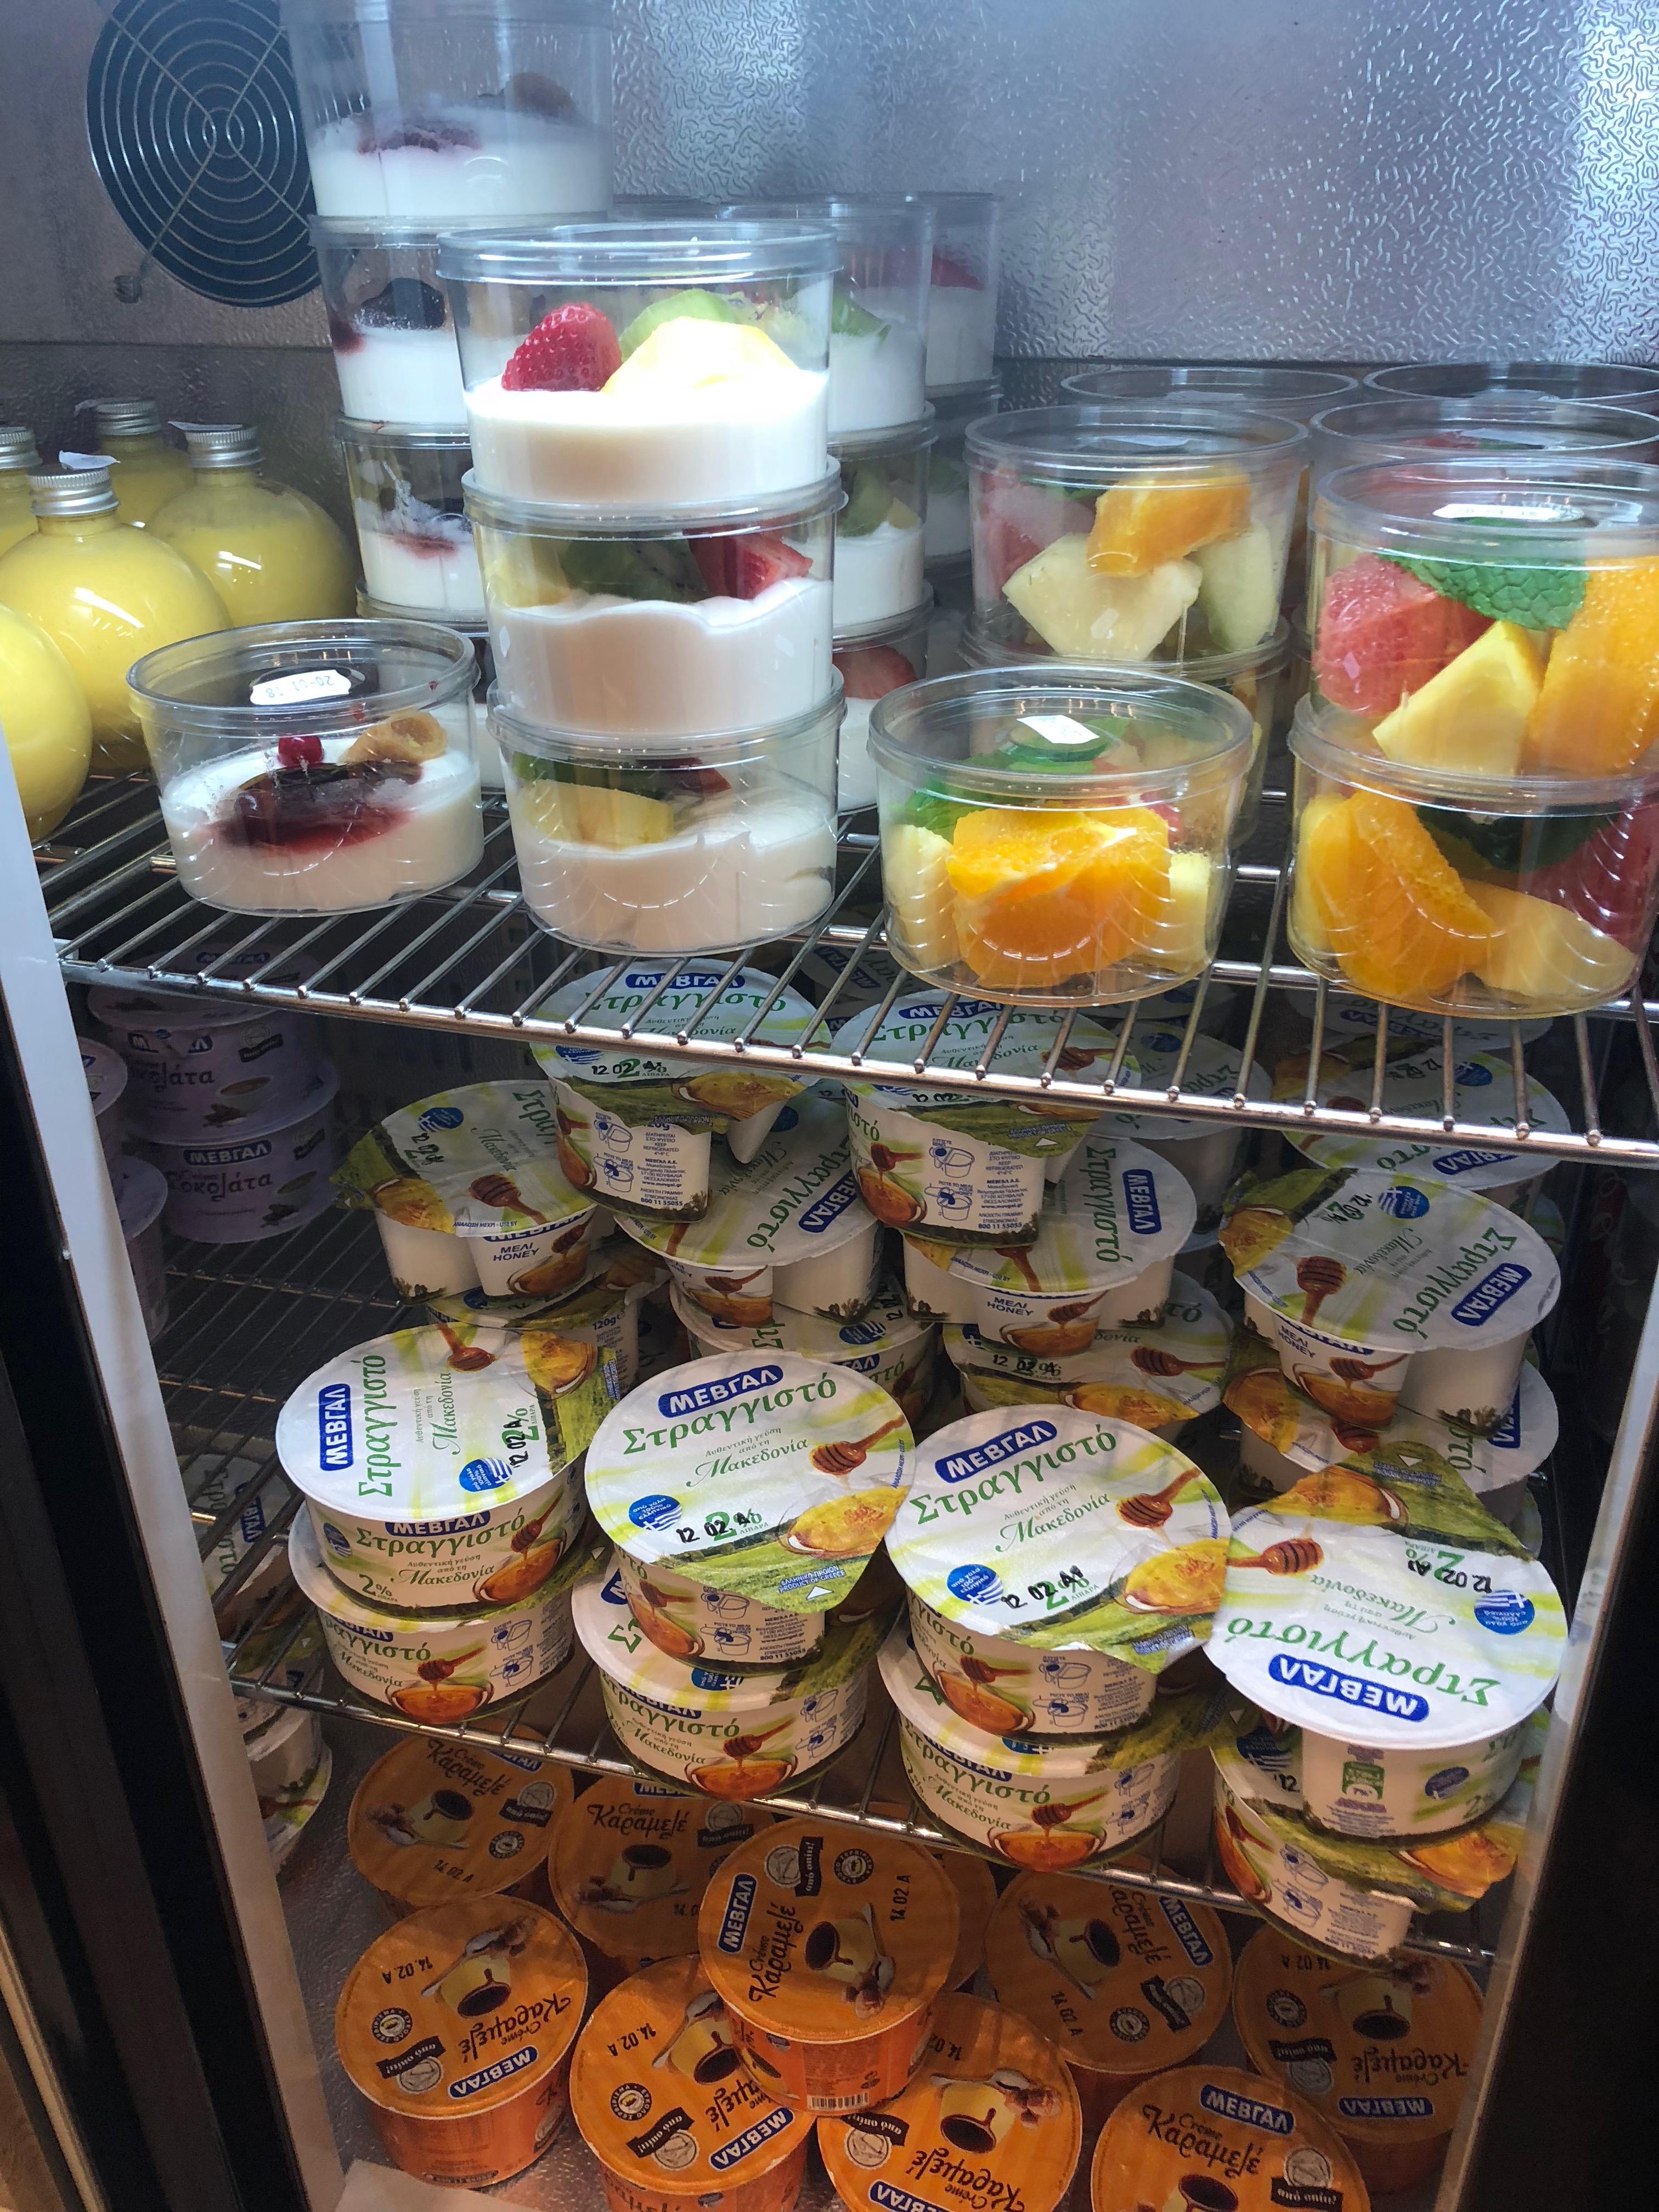 Obstsalat, Joghurt